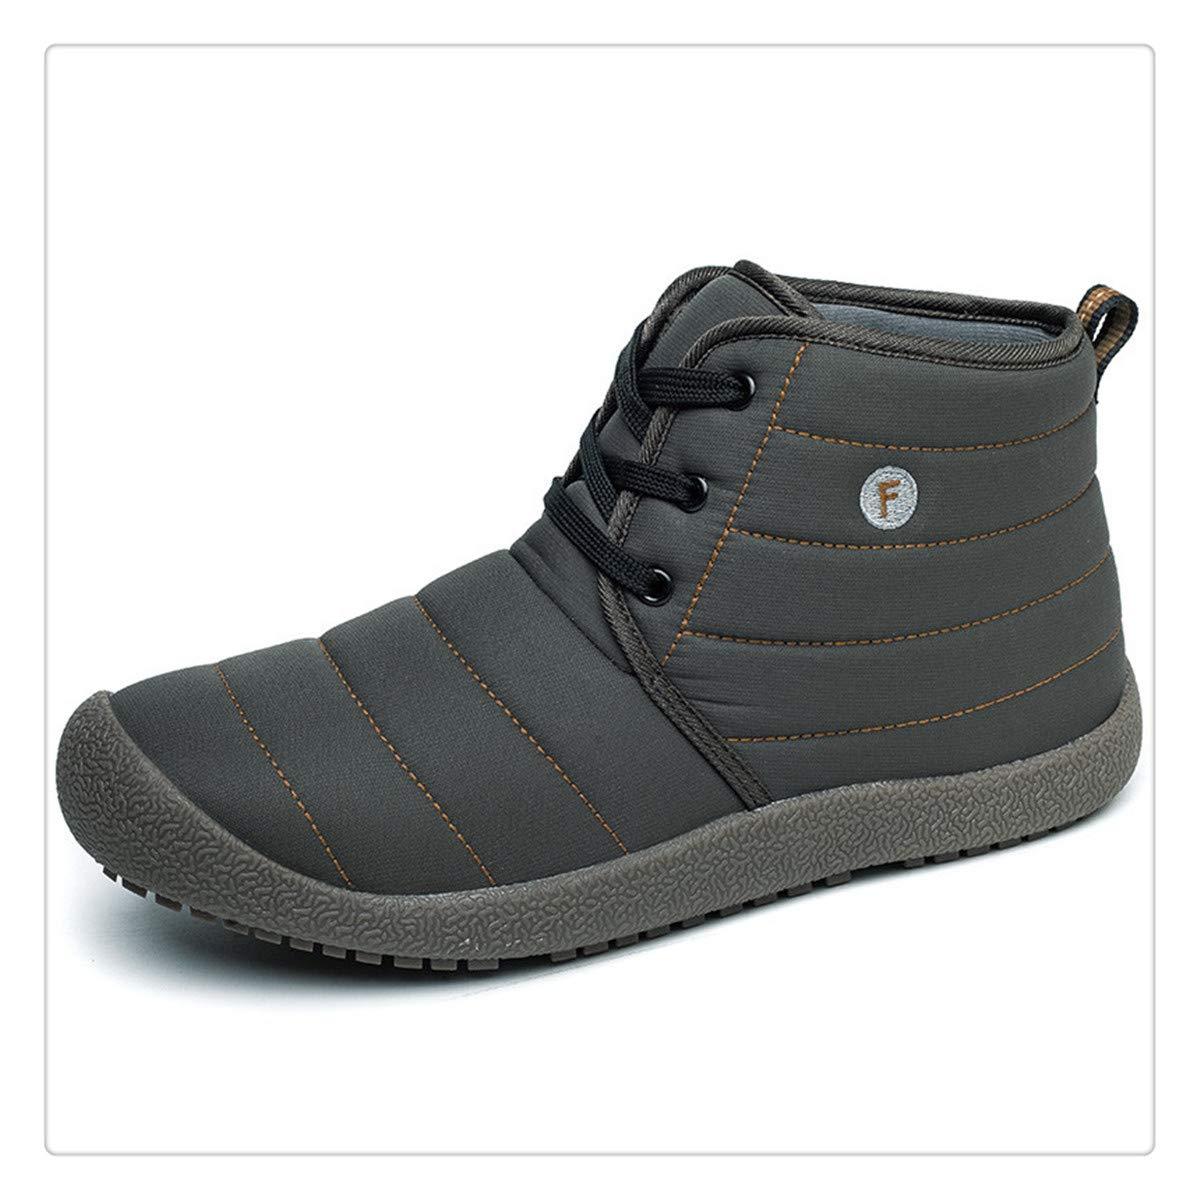 38-48 Winter Boots Men Plush Warm Winter Men Boots Work Shoes Safety